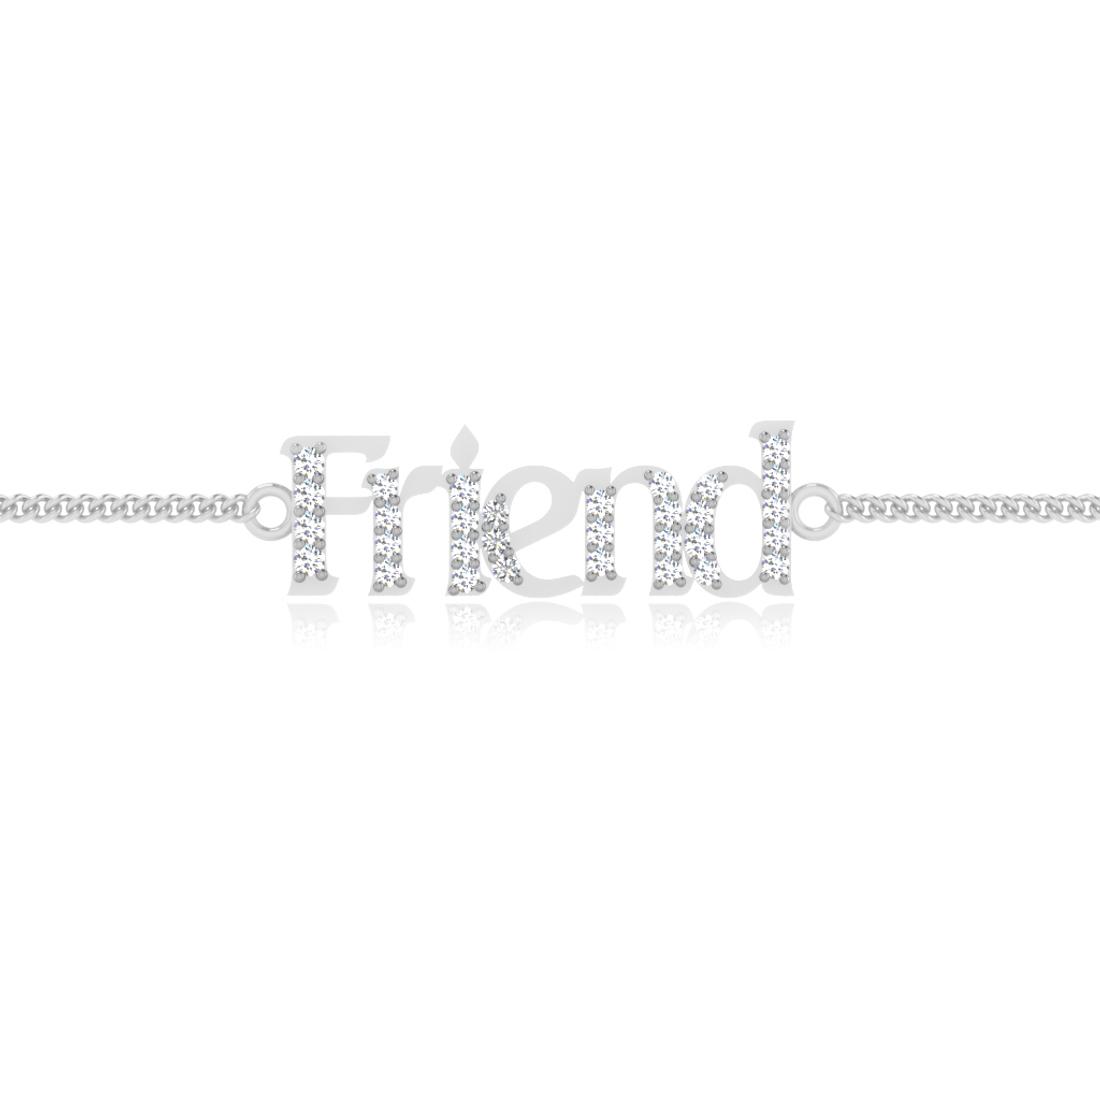 Chaitrika Friend Bracelet